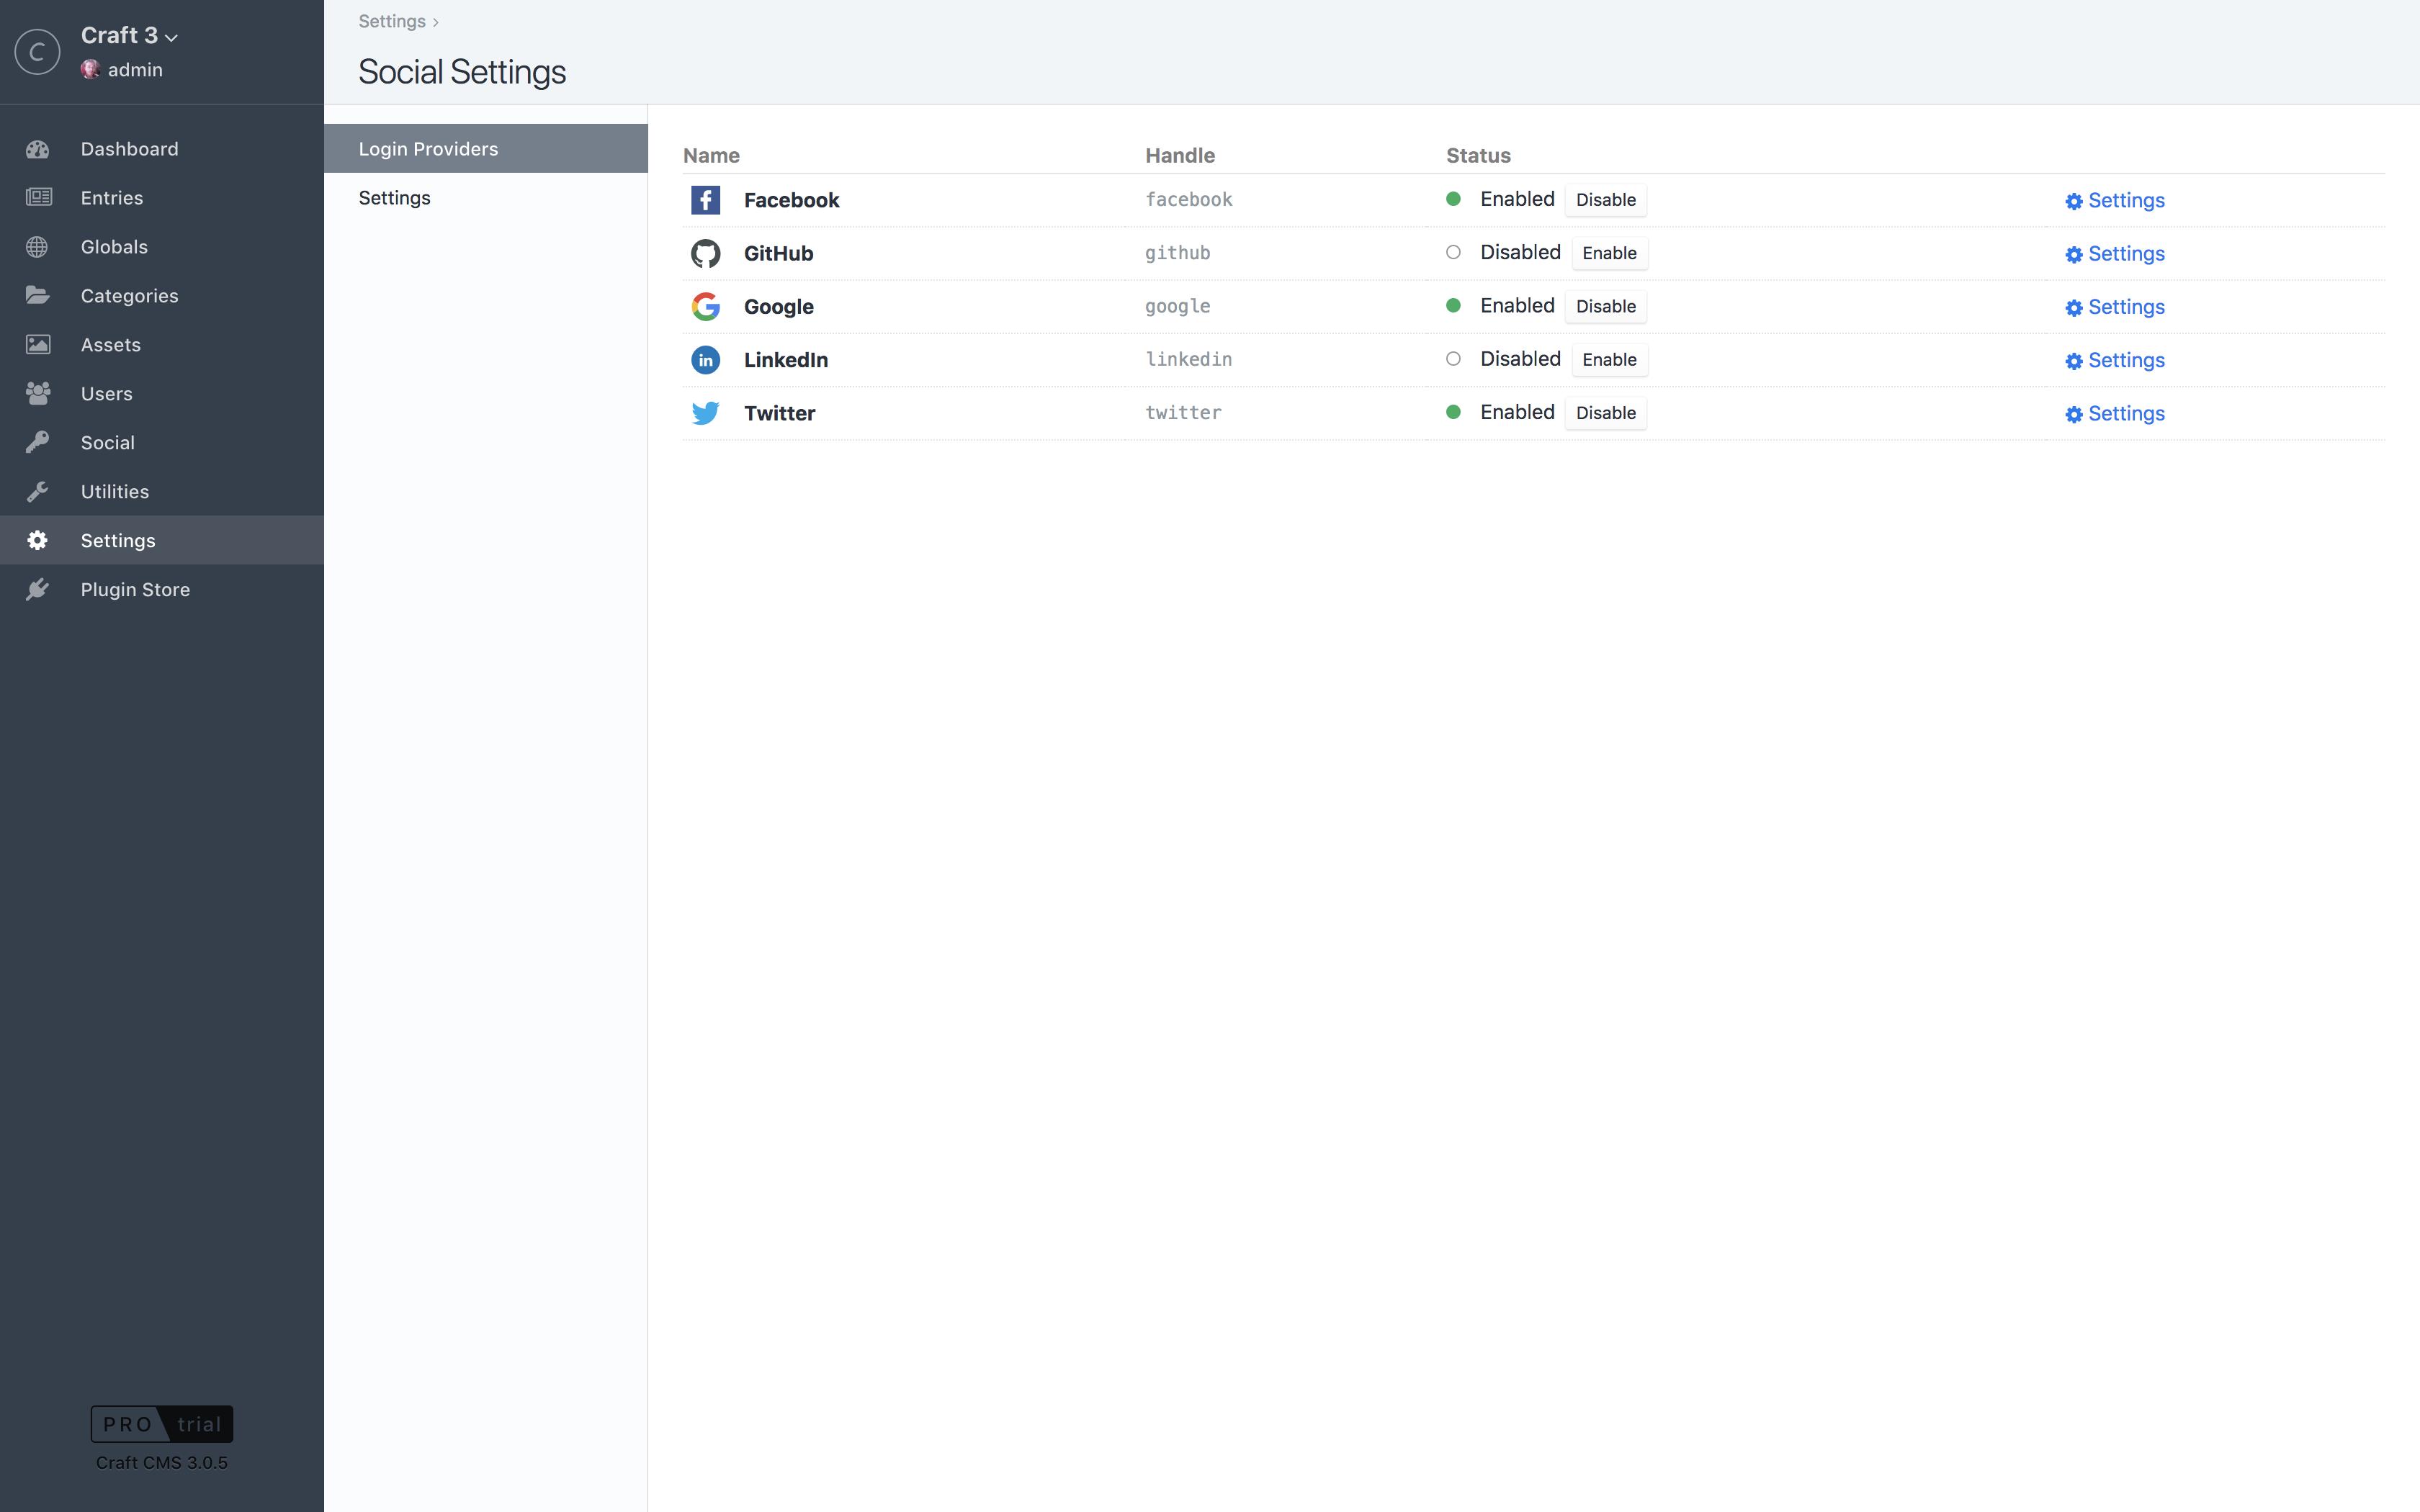 Social Screenshot: Social-Login-Providers